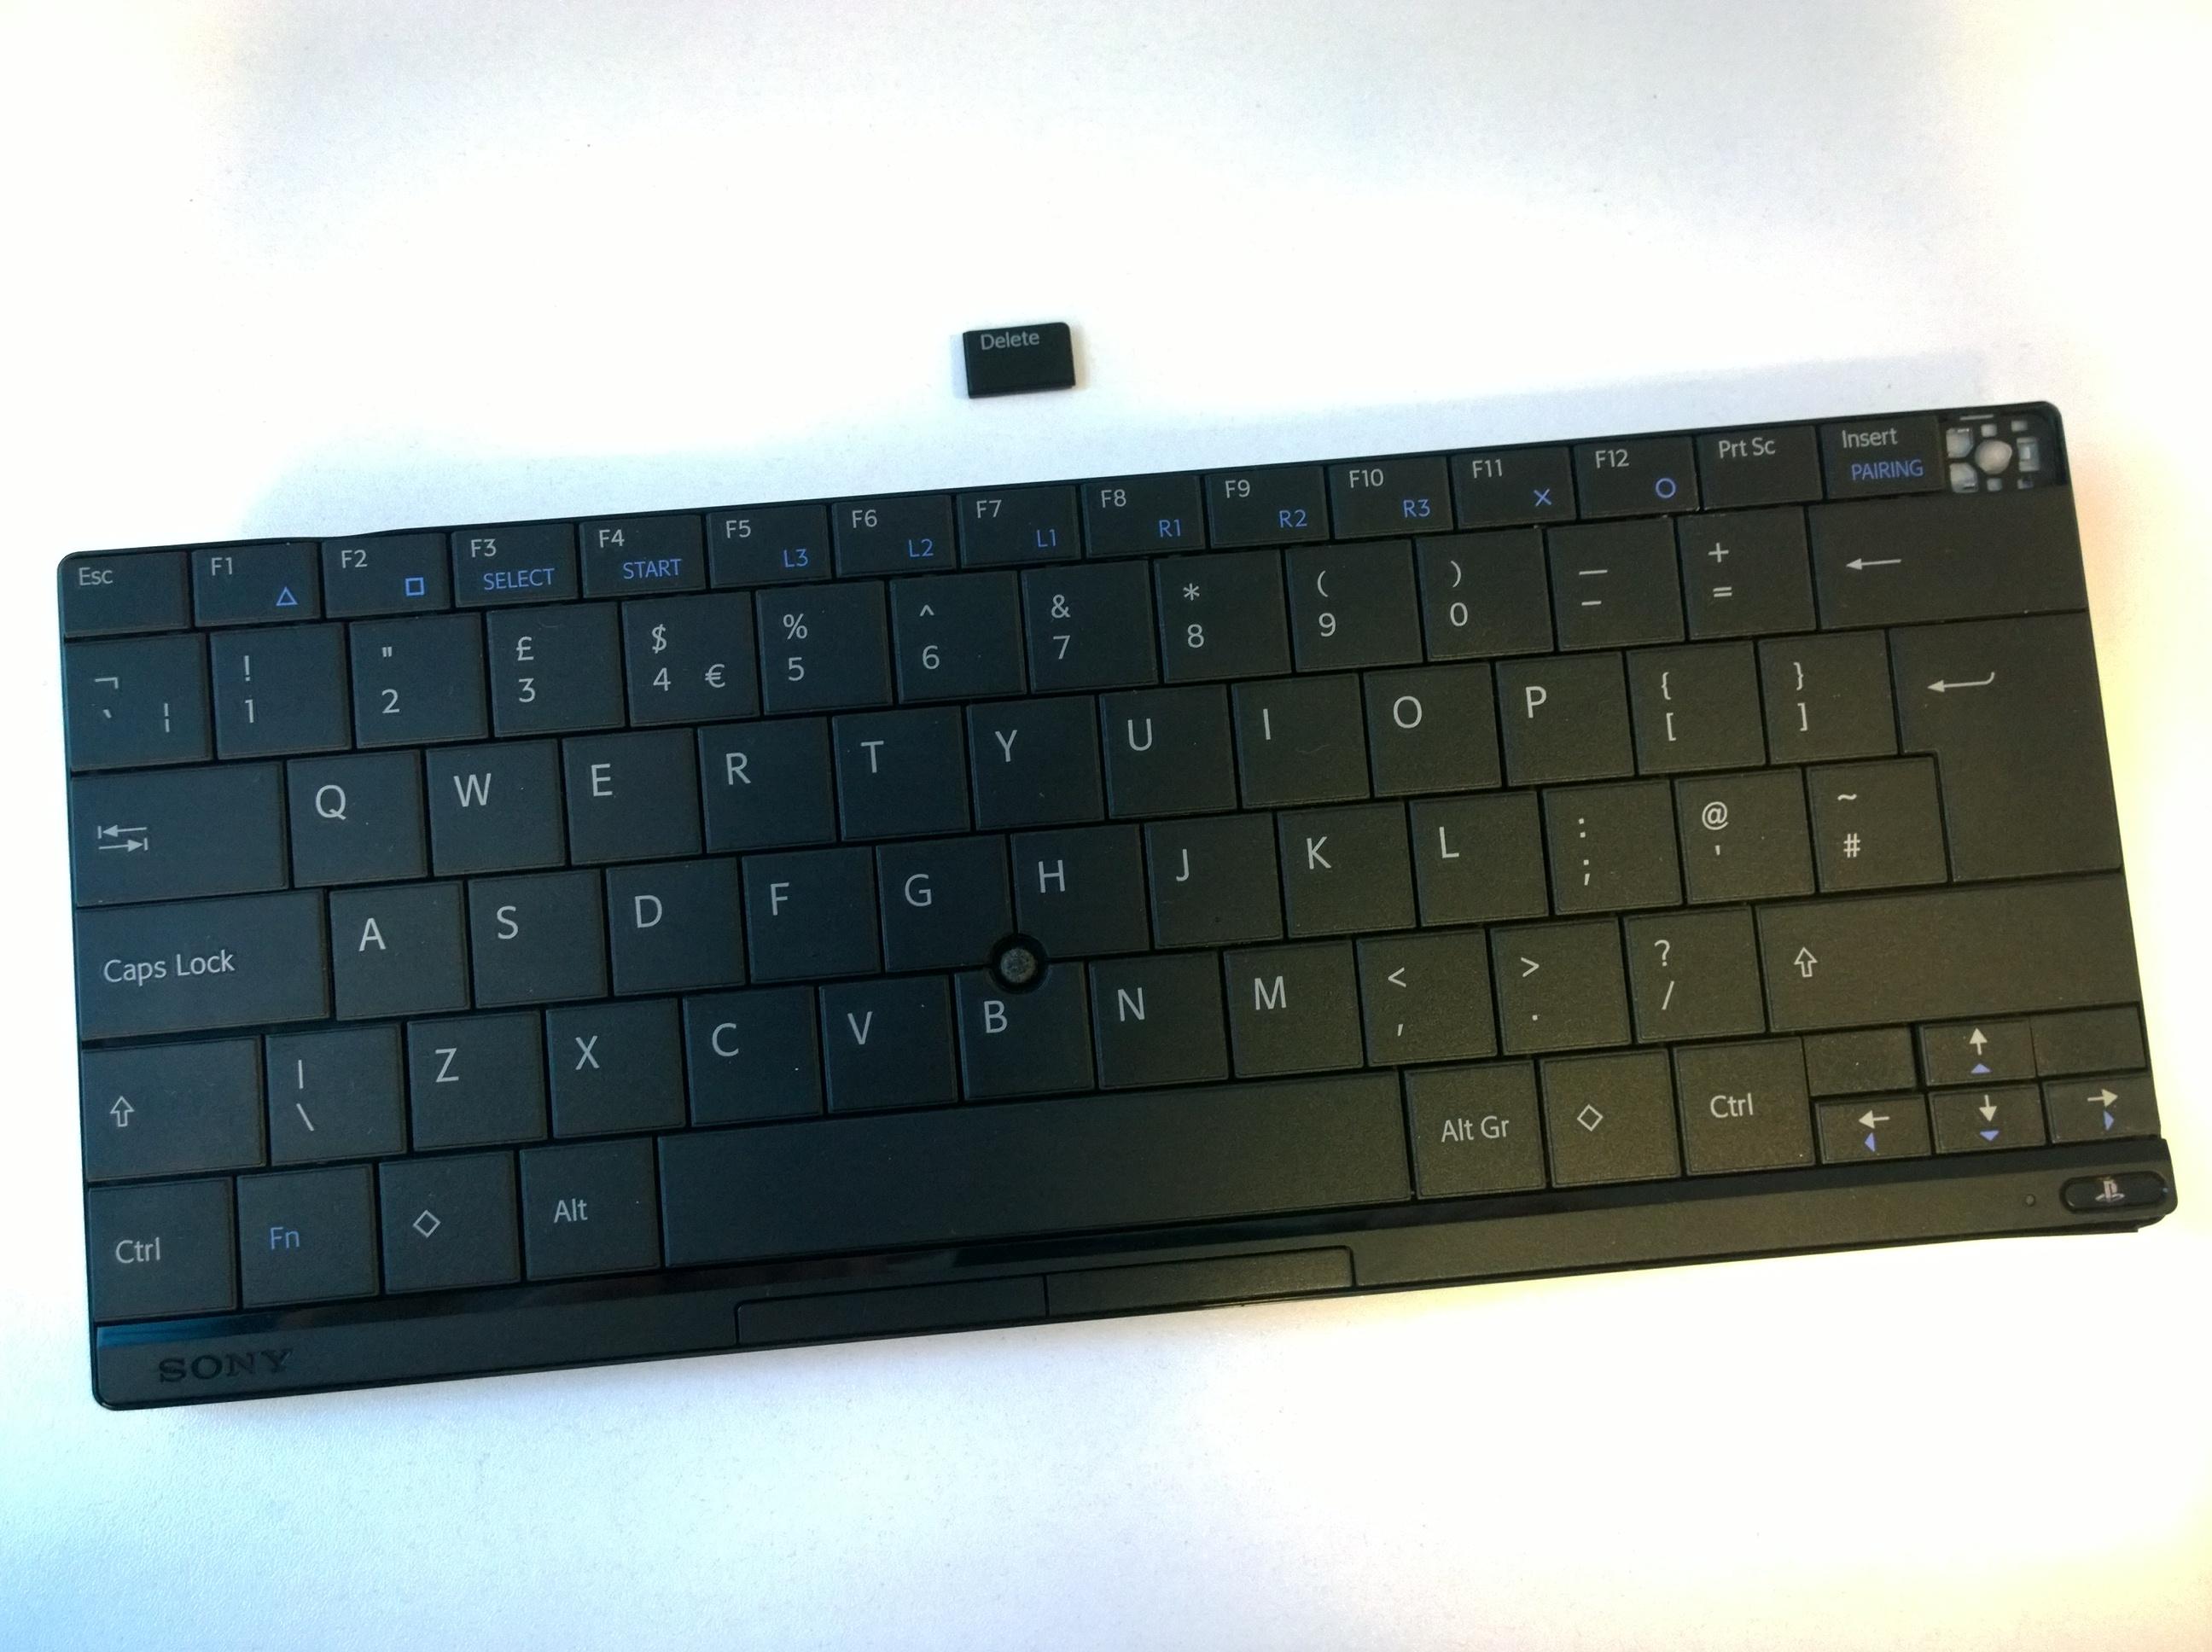 [PS3] Klávesnice Sony Wireless Keyboard (bez jedné klávesy)